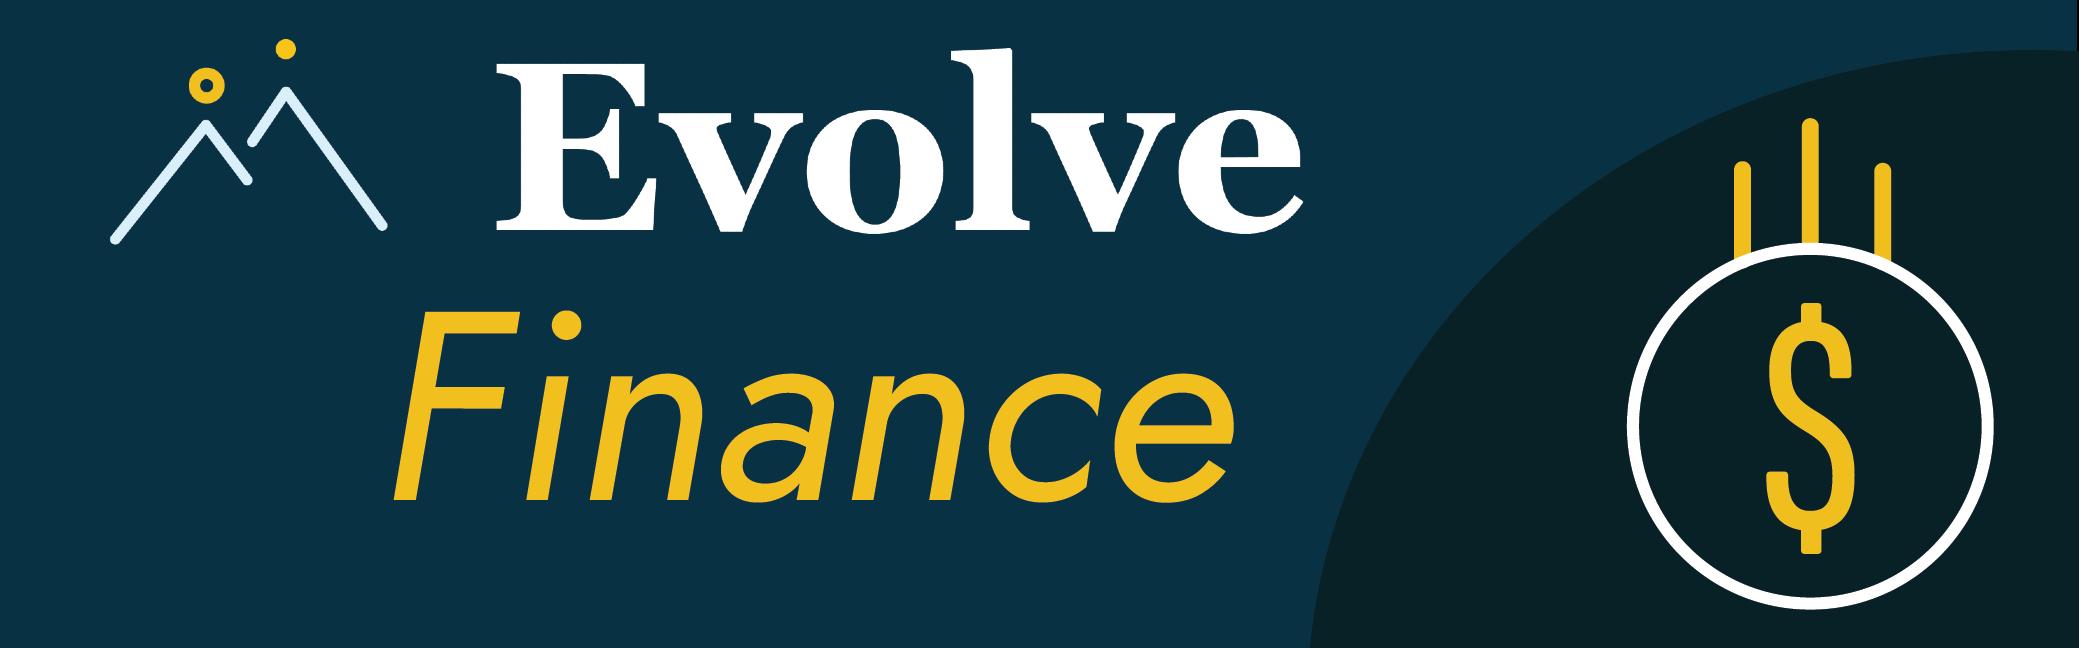 Evolve Finance